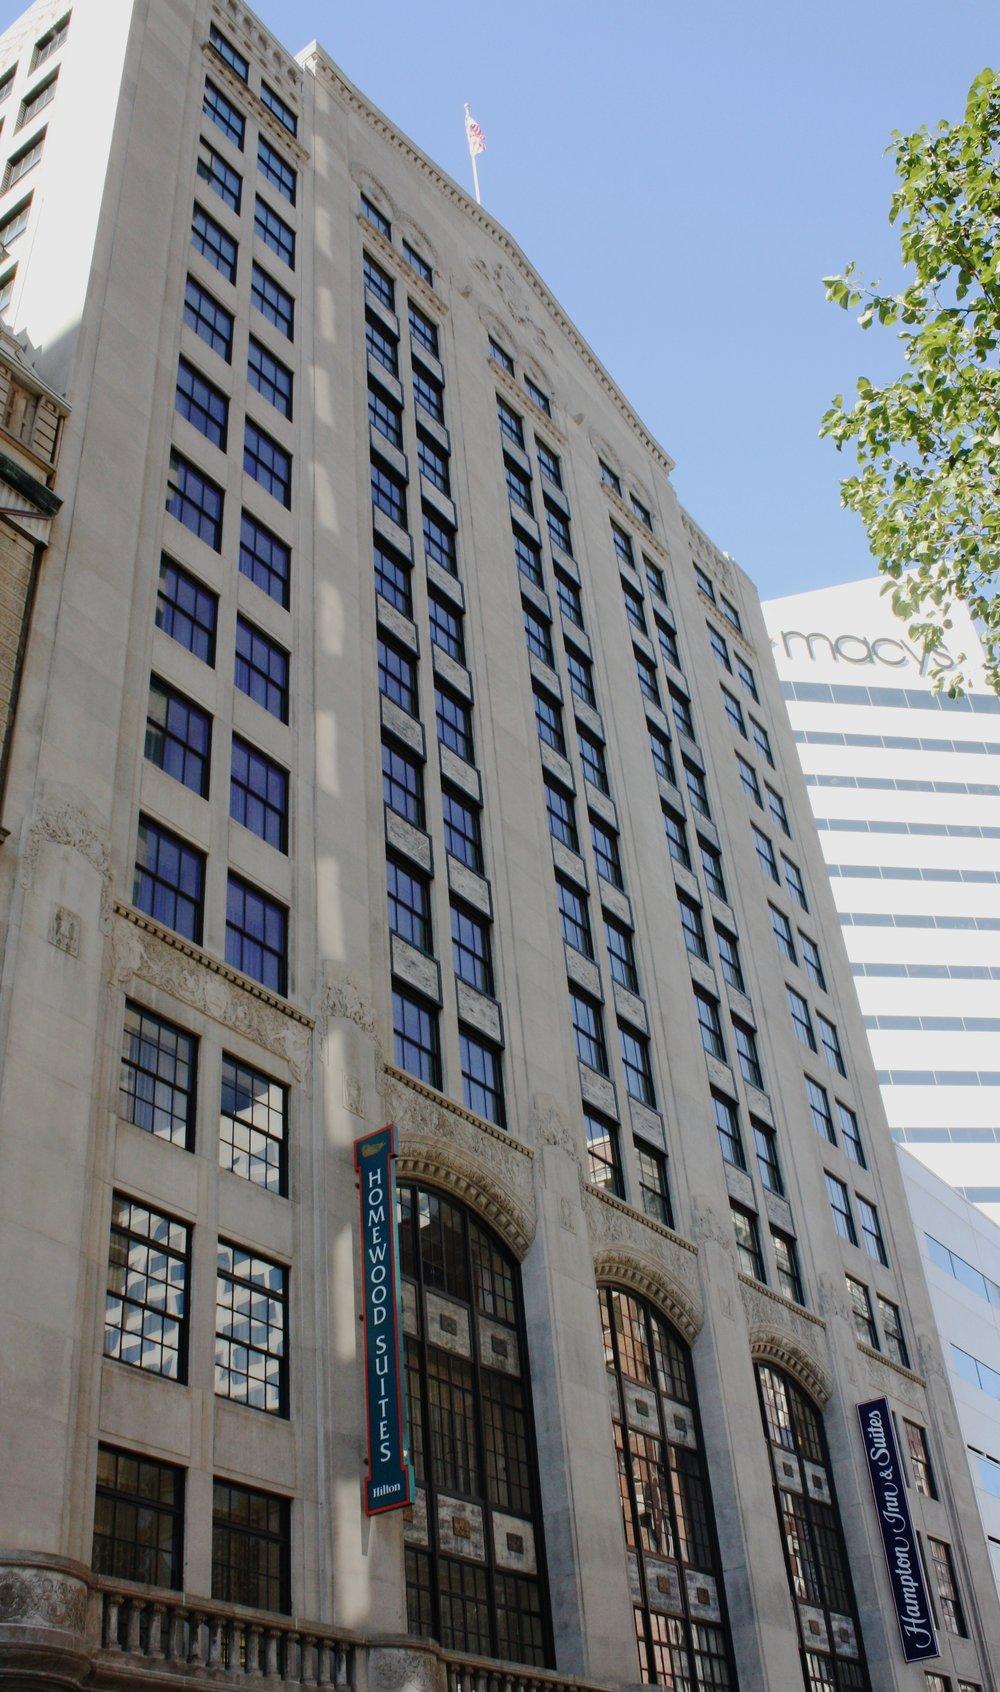 Cincinnati Enquirer Building